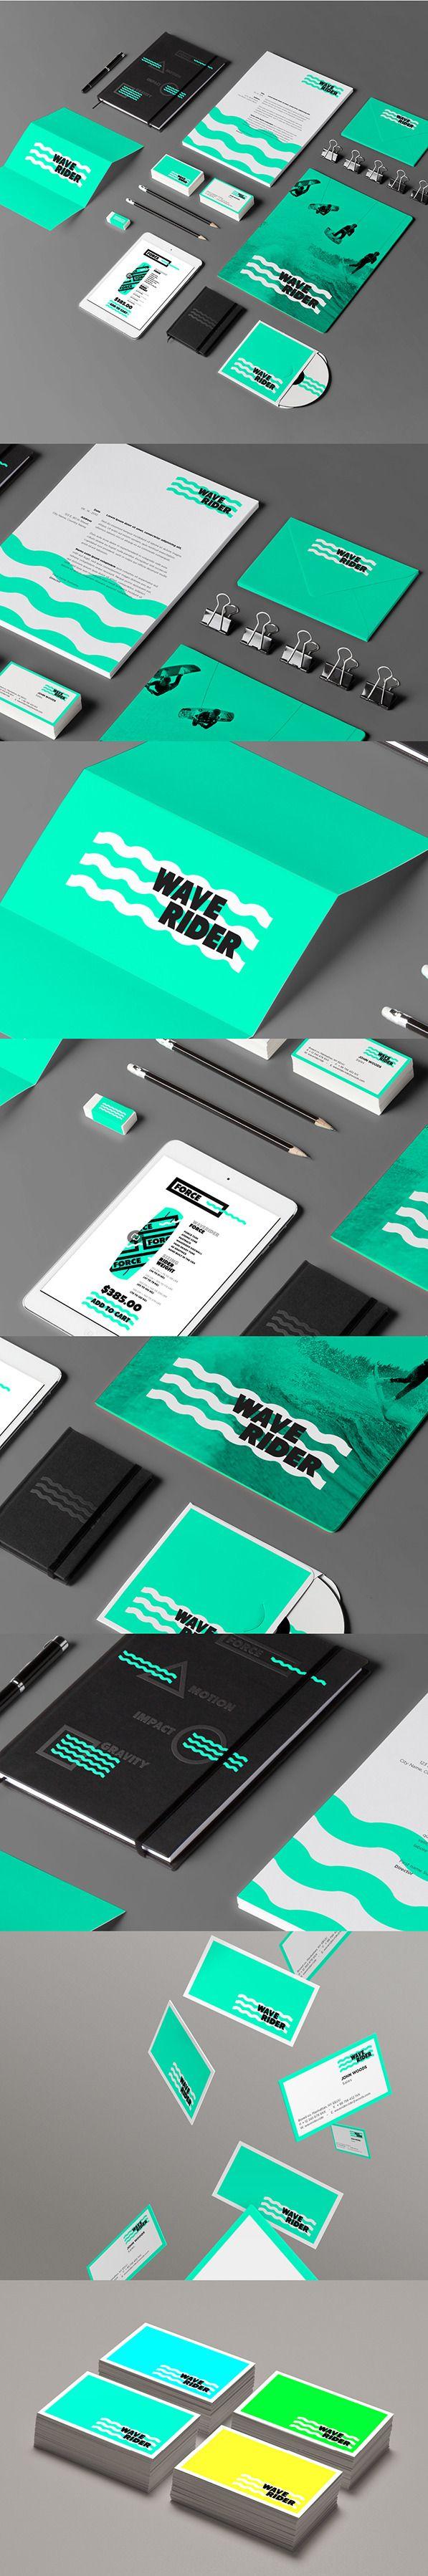 WAVERIDER // Branding by Jonathan Quintin